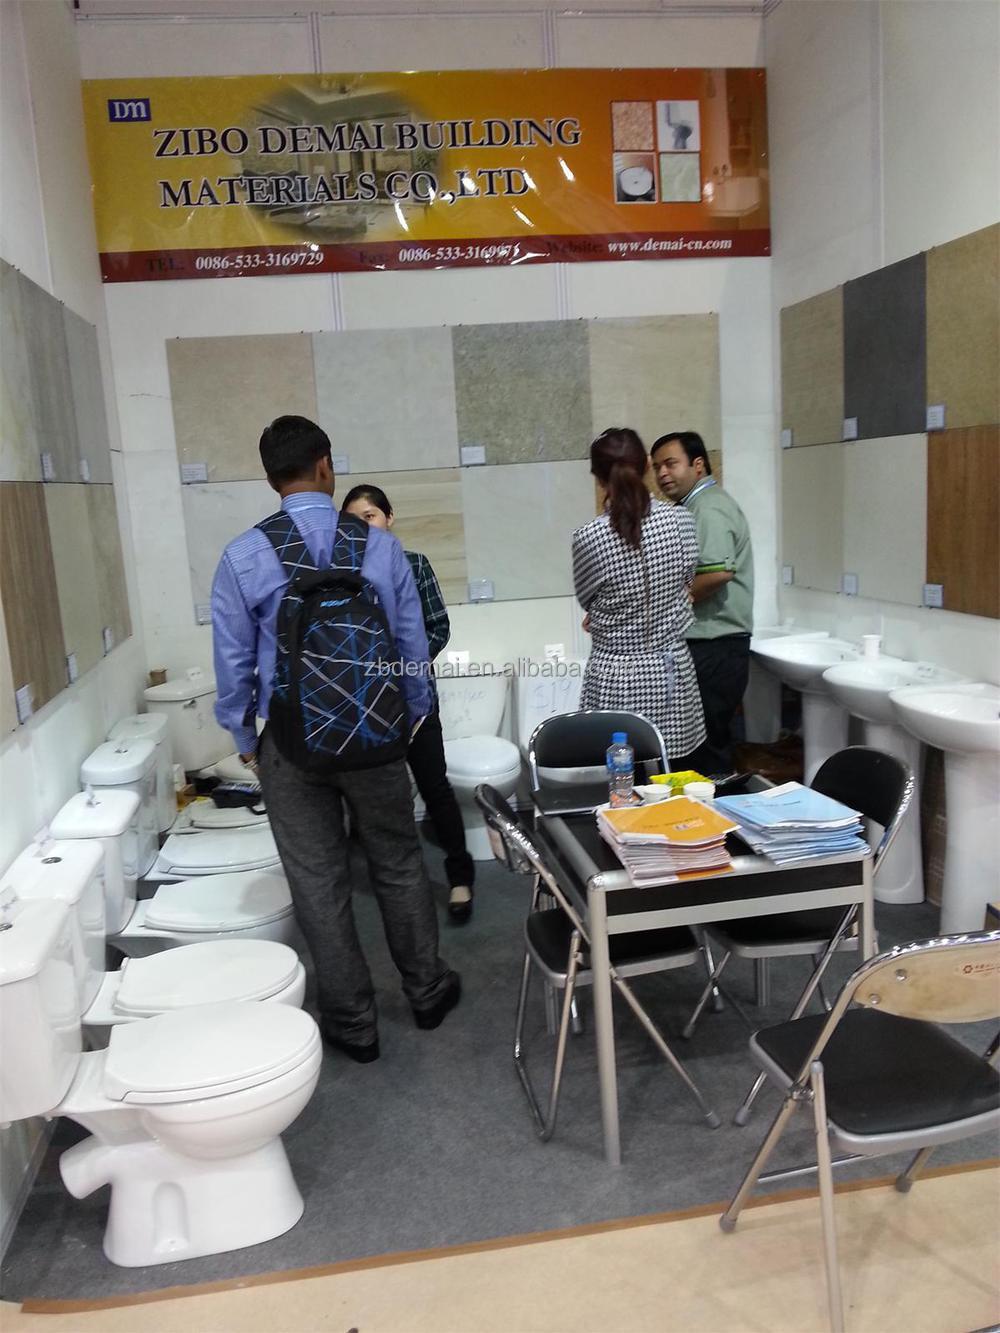 Dmt-403 Toilet On Stock! American Standard Toilet,Siphonic Flushing ...